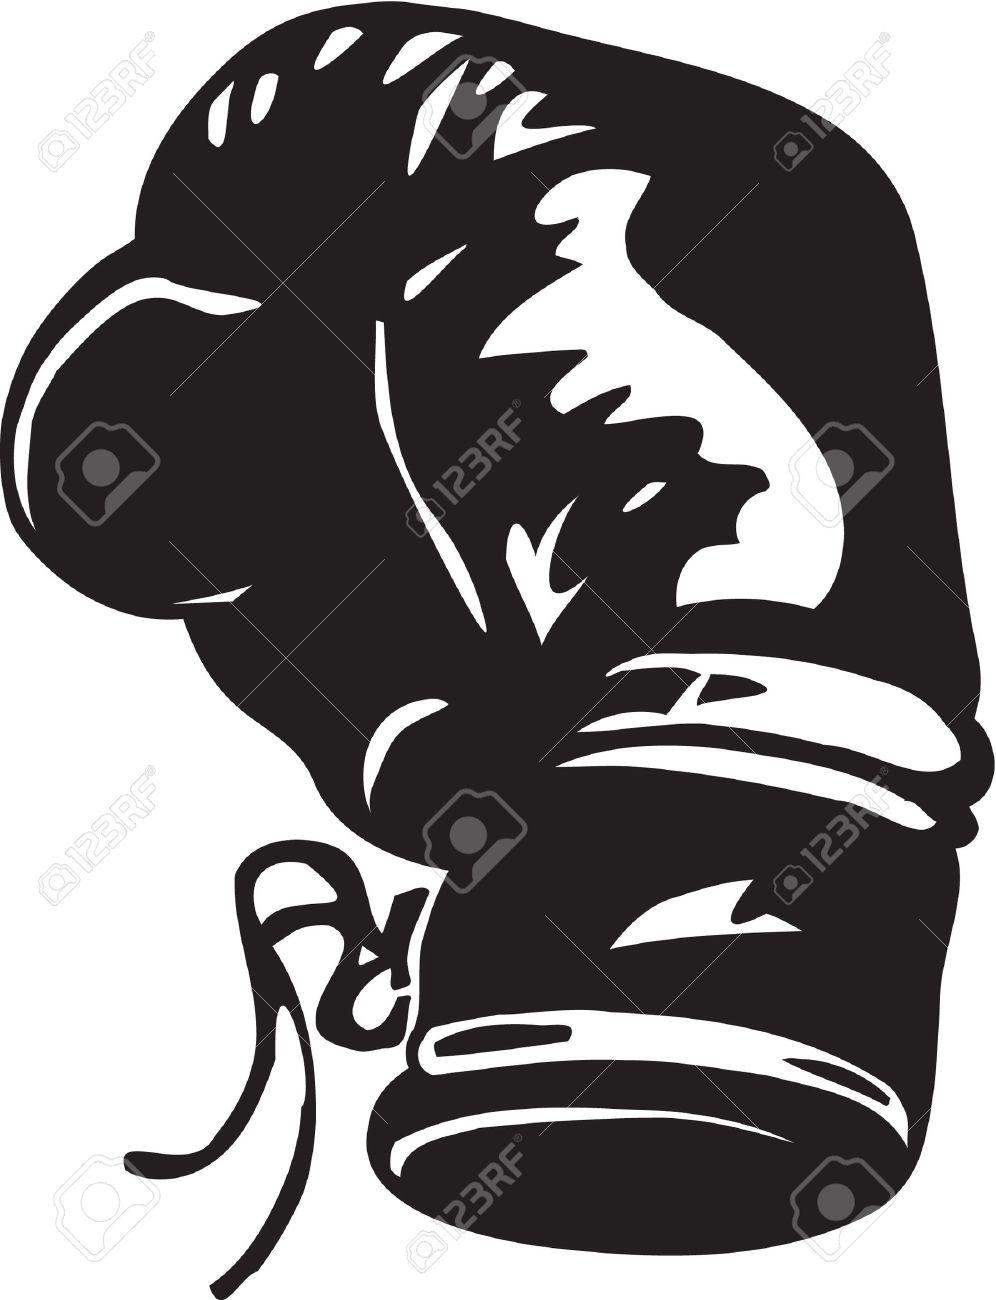 996x1300 Black clipart boxing glove